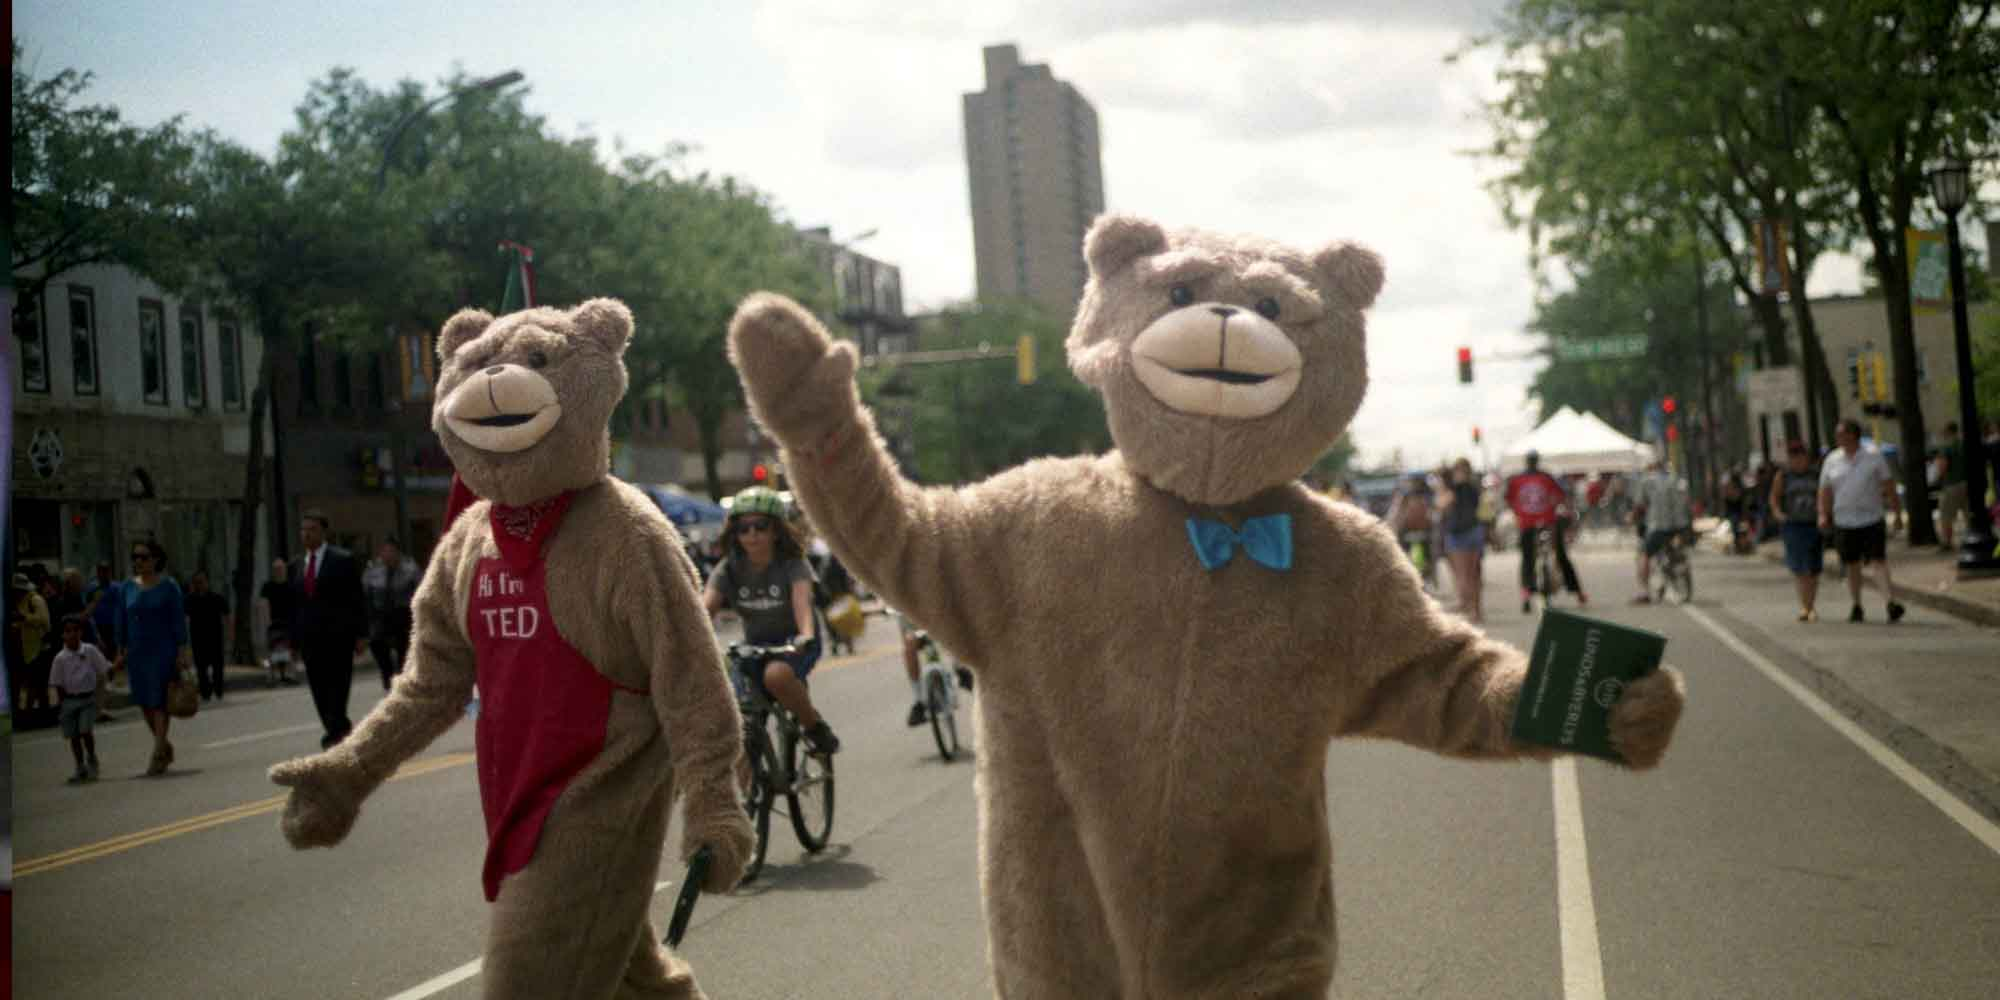 People in bear costume walking in road